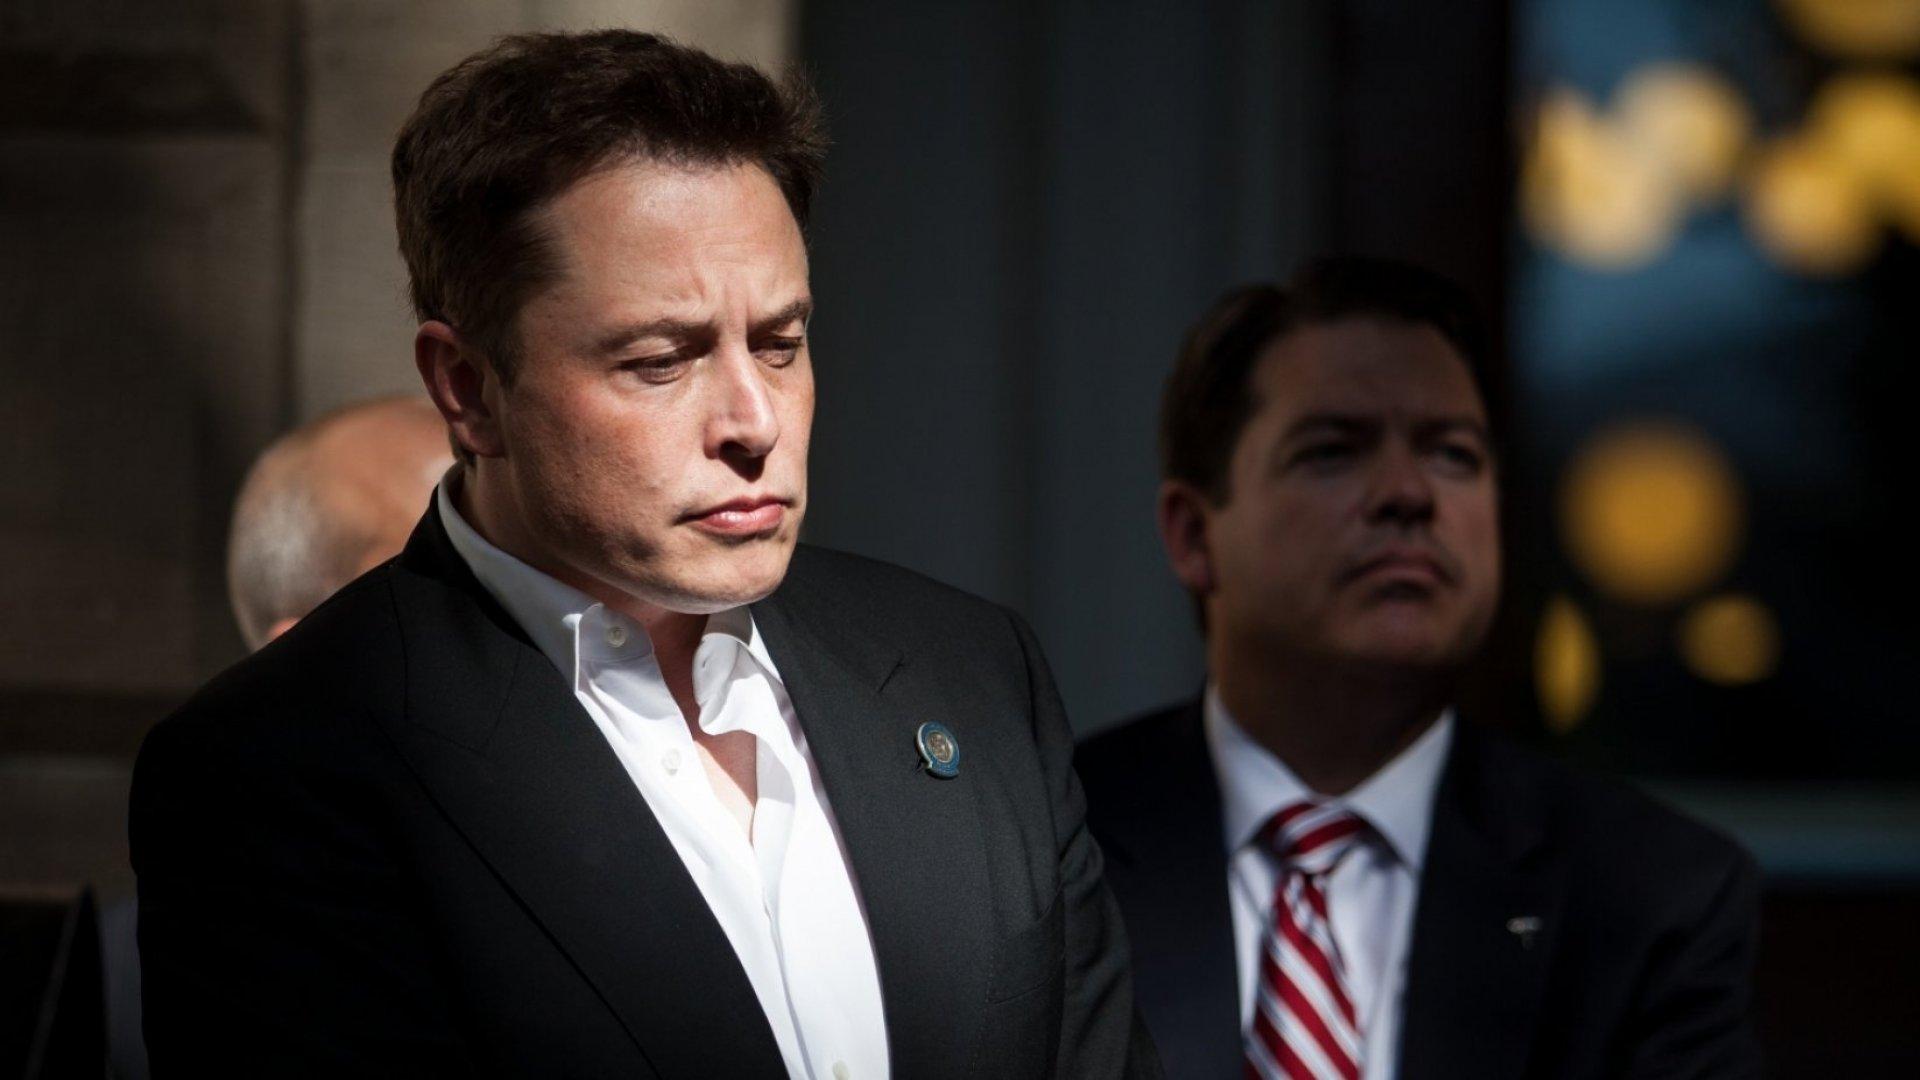 According to Elon Musk, Artificial Intelligence Will Cause World War III